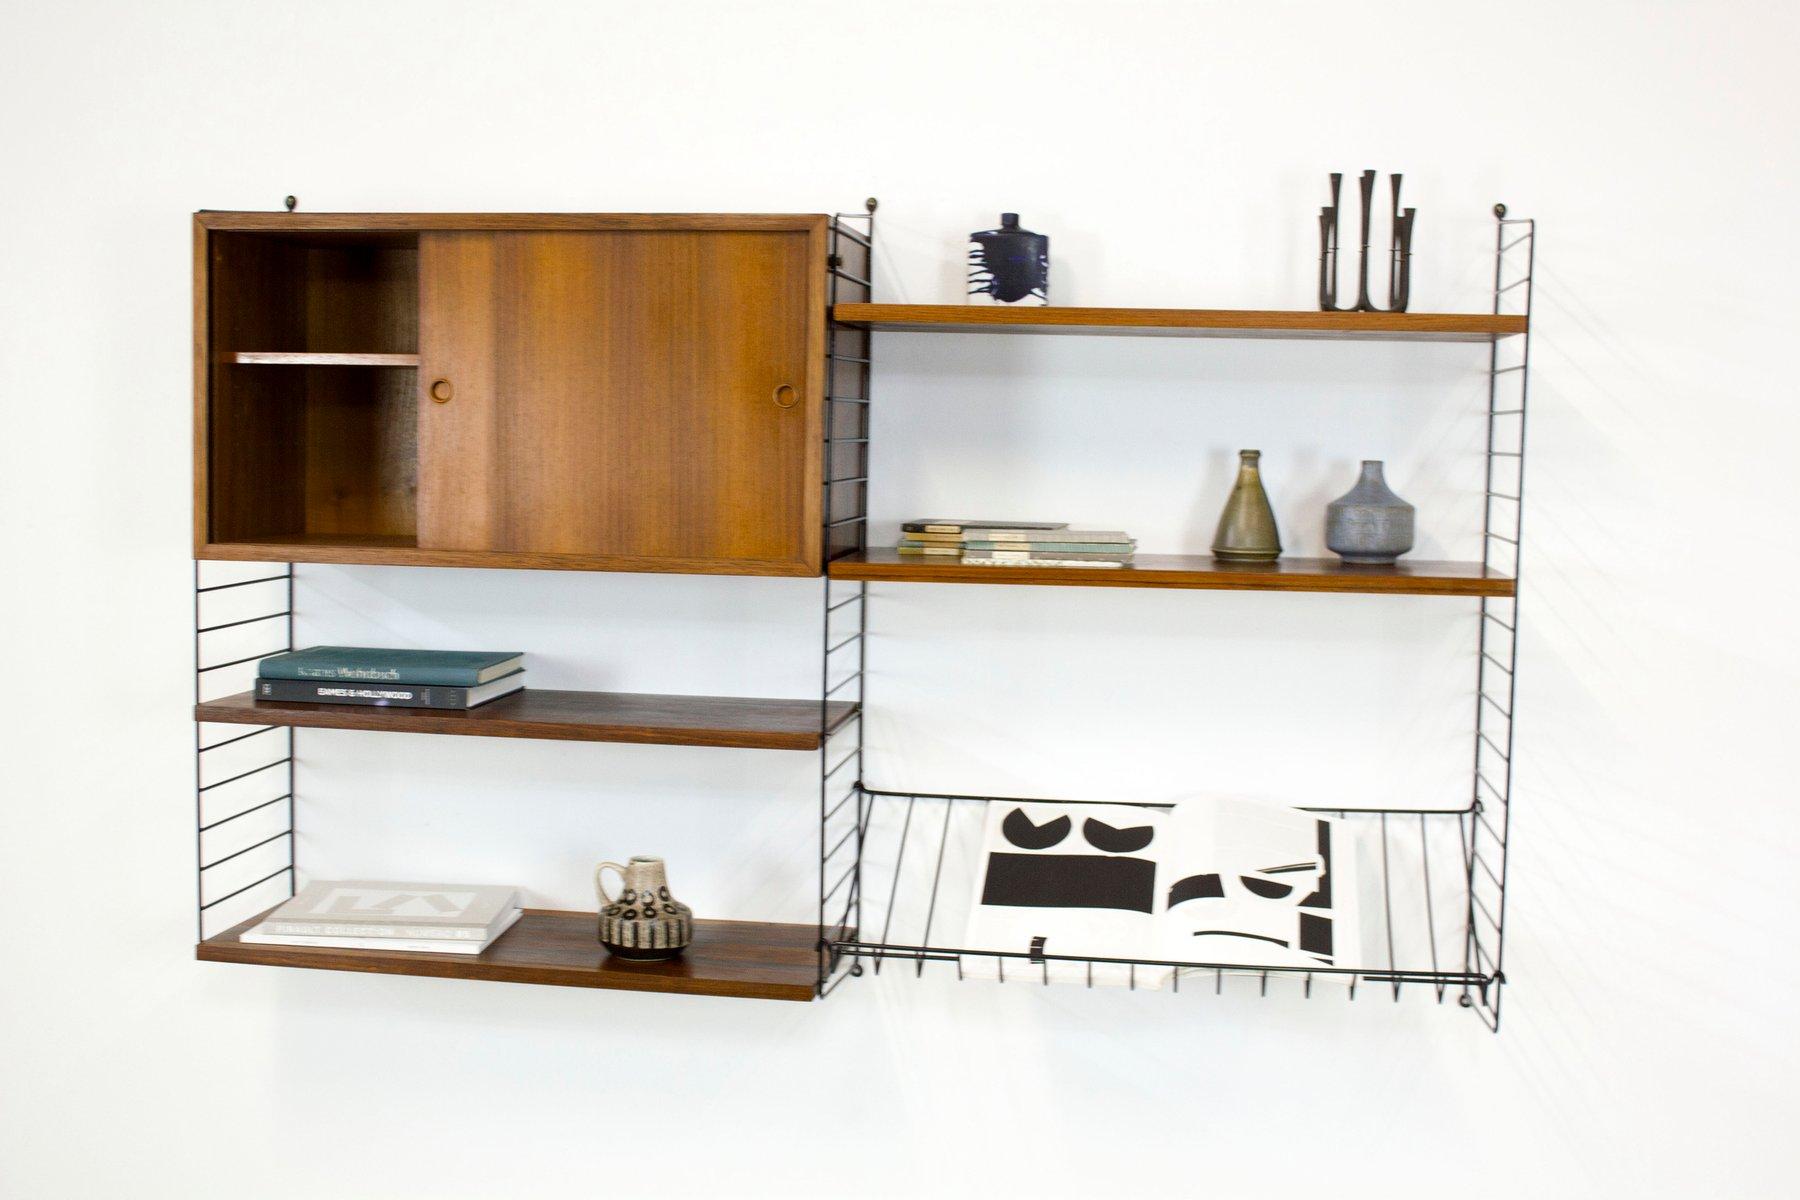 vintage palisander furnier regal system von katja nisse strinning f r string bei pamono kaufen. Black Bedroom Furniture Sets. Home Design Ideas